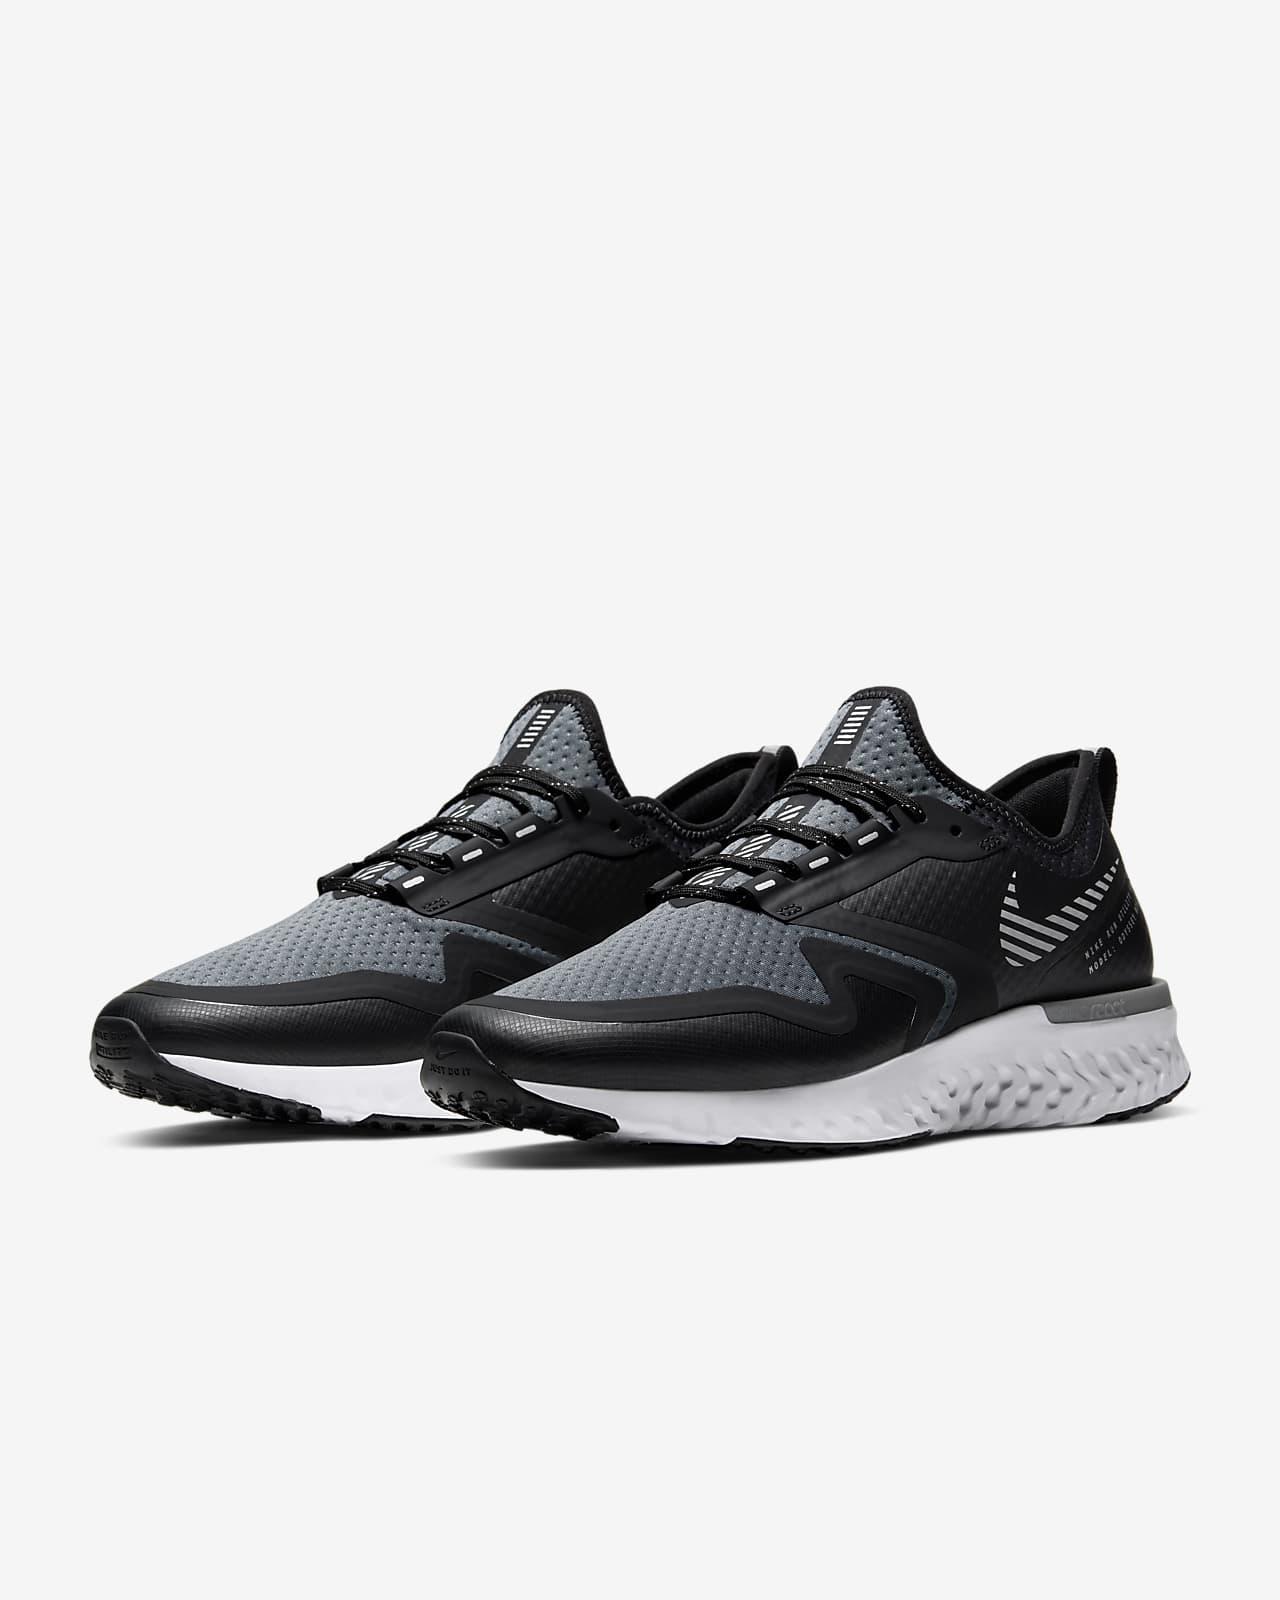 un poco Monet Maestría  Nike Odyssey React Shield 2 Men's Running Shoe. Nike LU